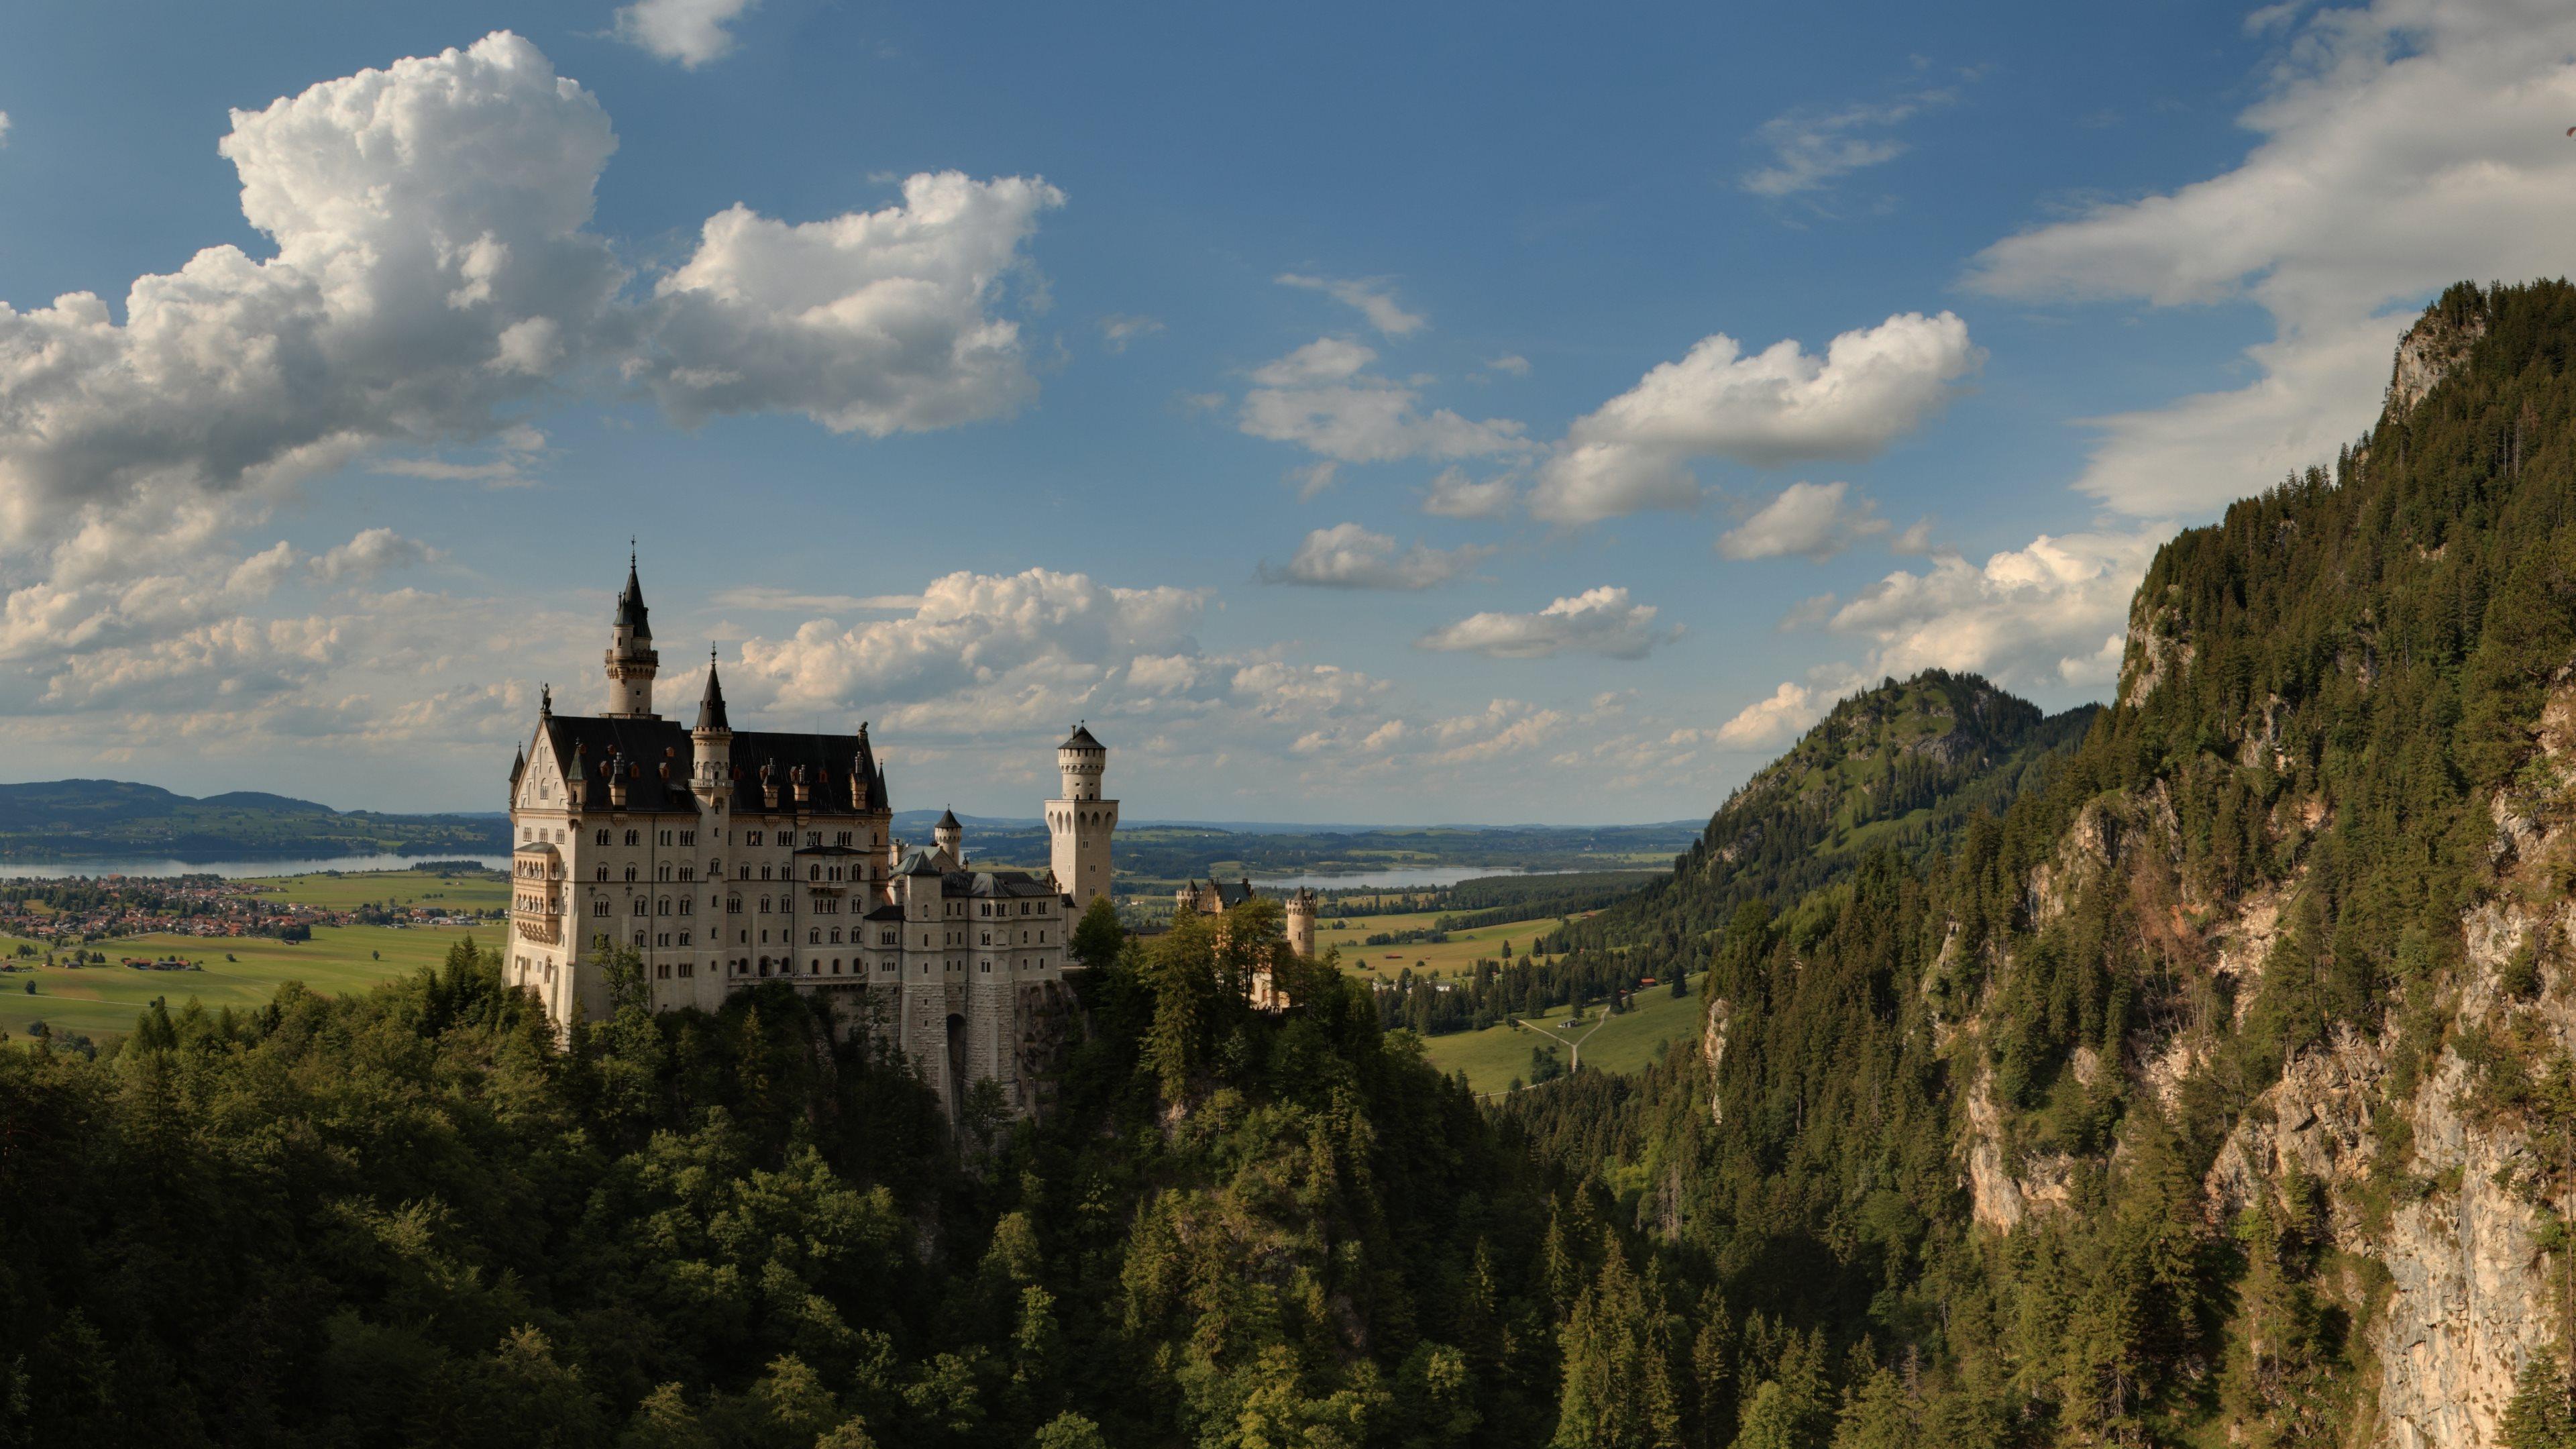 neuschwanstein castle 4k ultra hd wallpaper and background